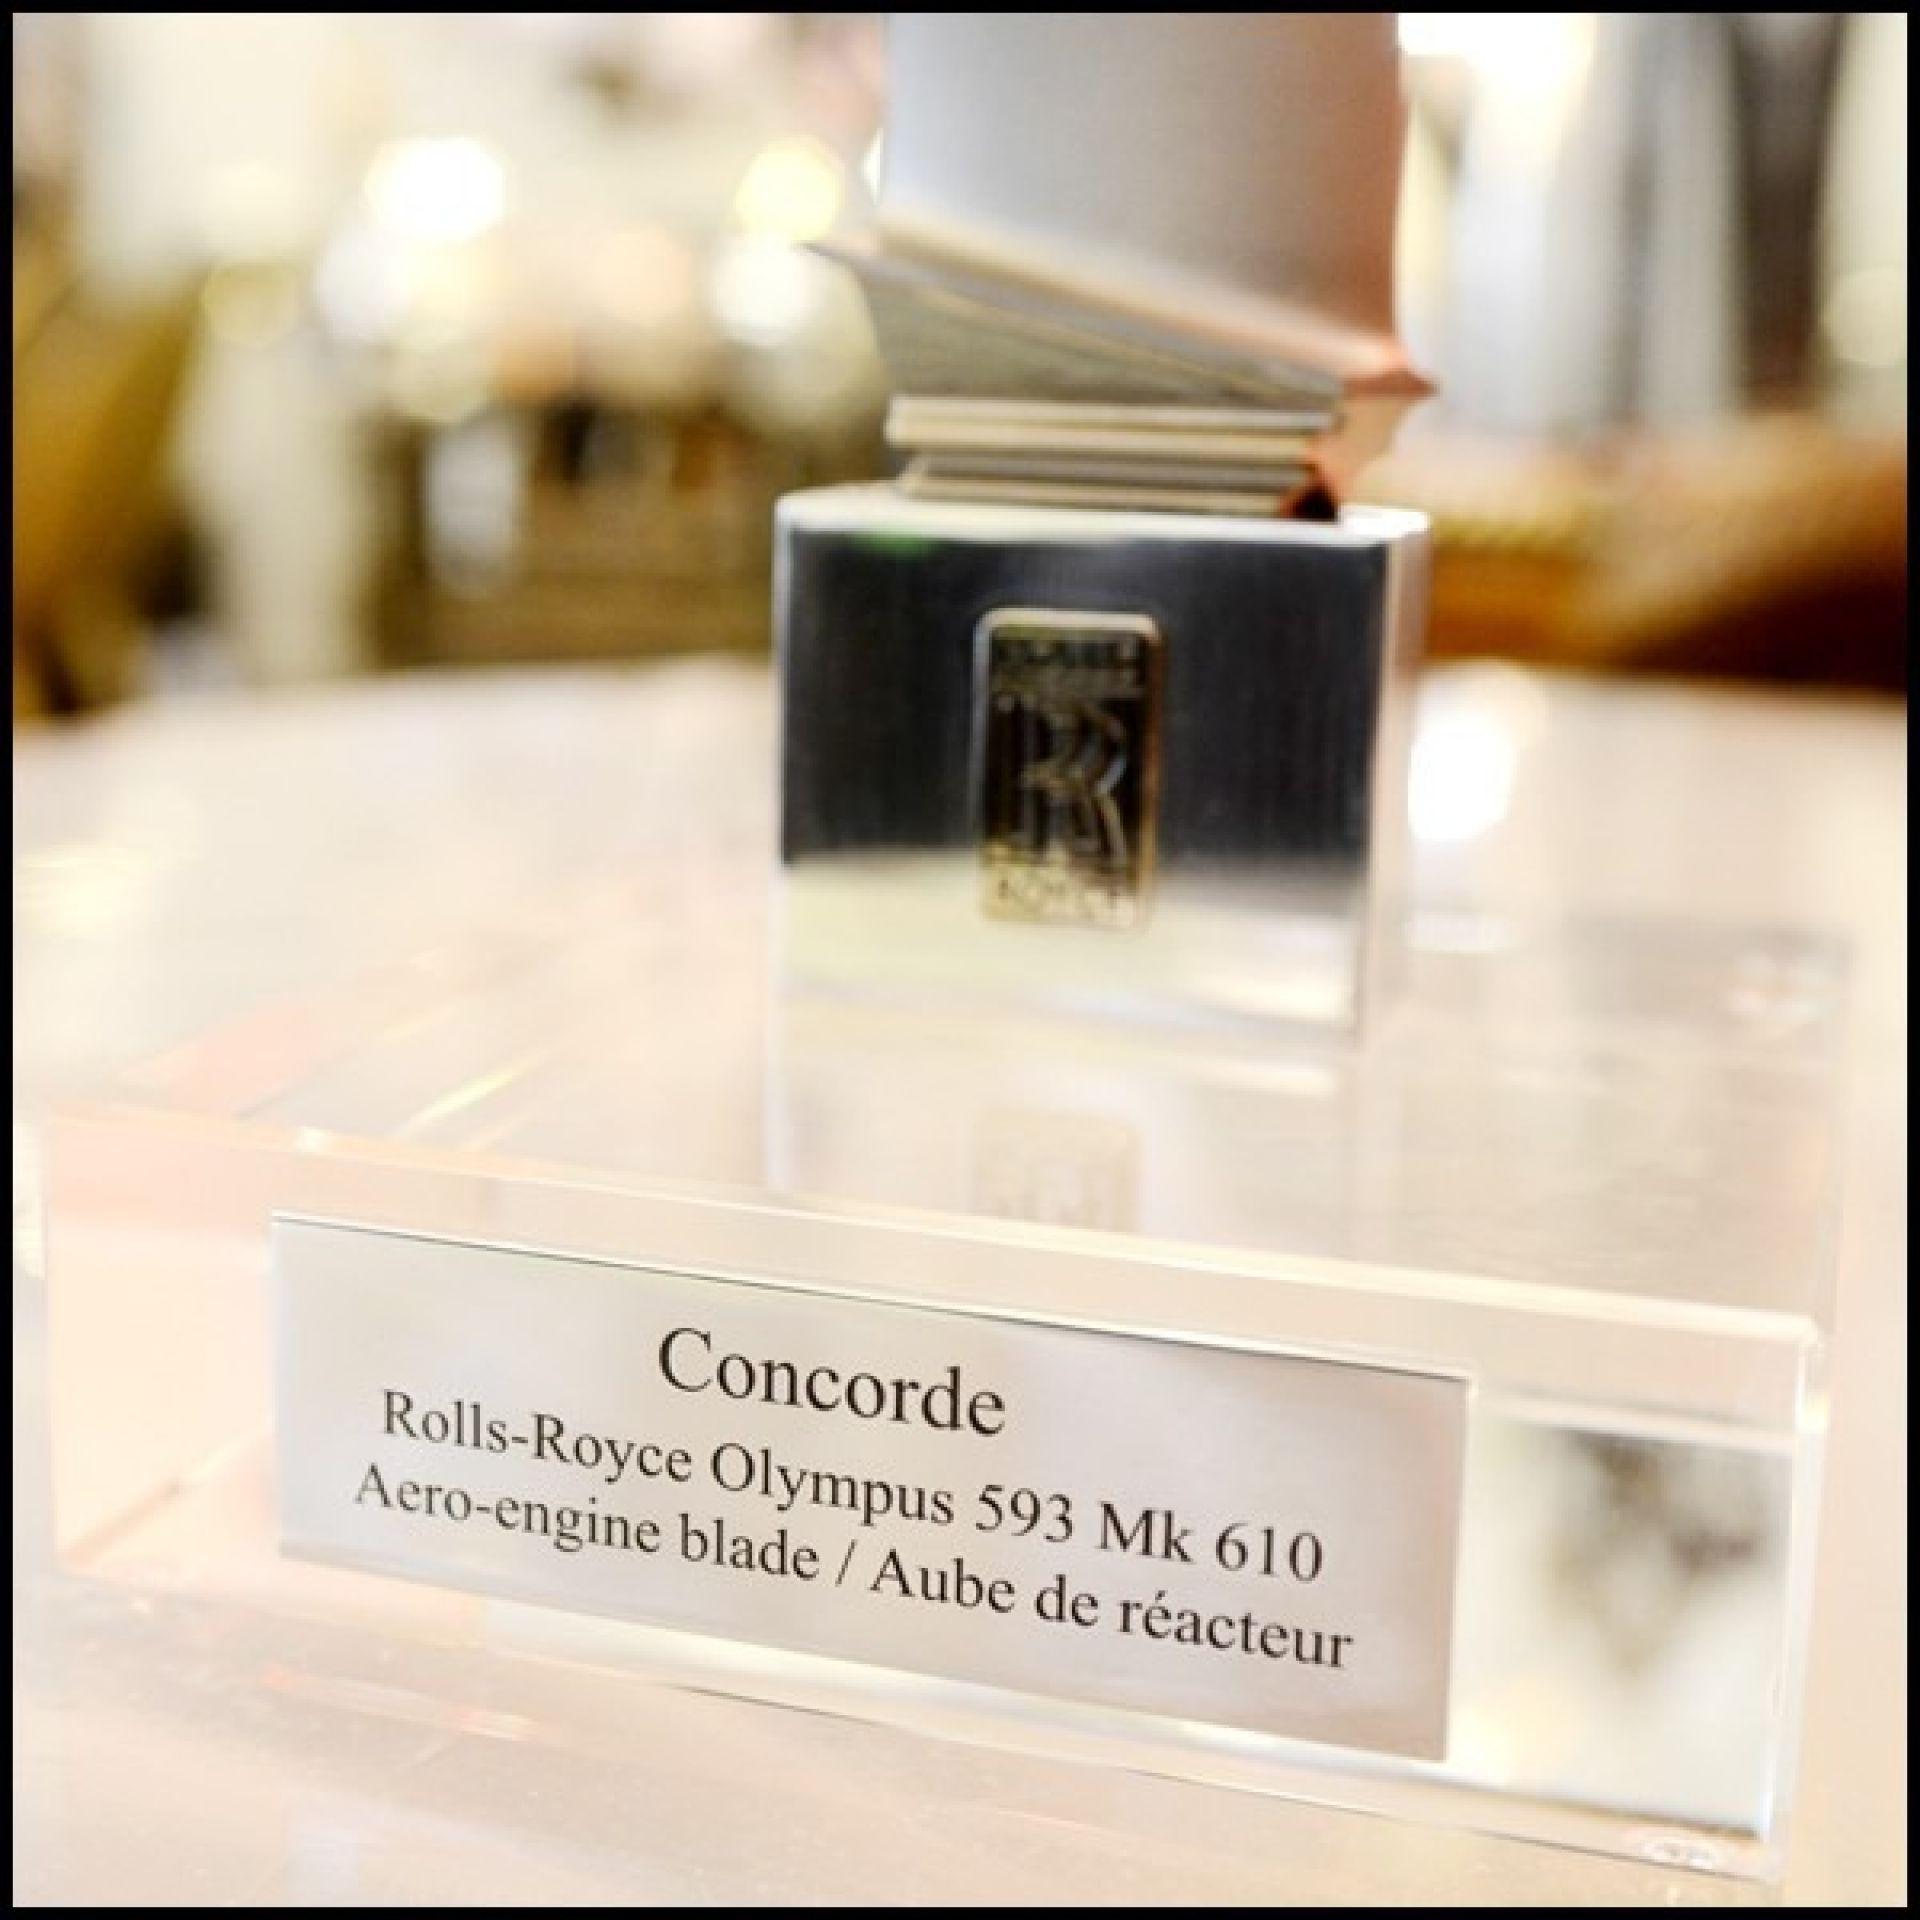 OLYMPUS 593 MK 610 PC-CONCORDE ROLLS-ROYCE SUPERSONIC REACTOR WING SCULPTURE 1